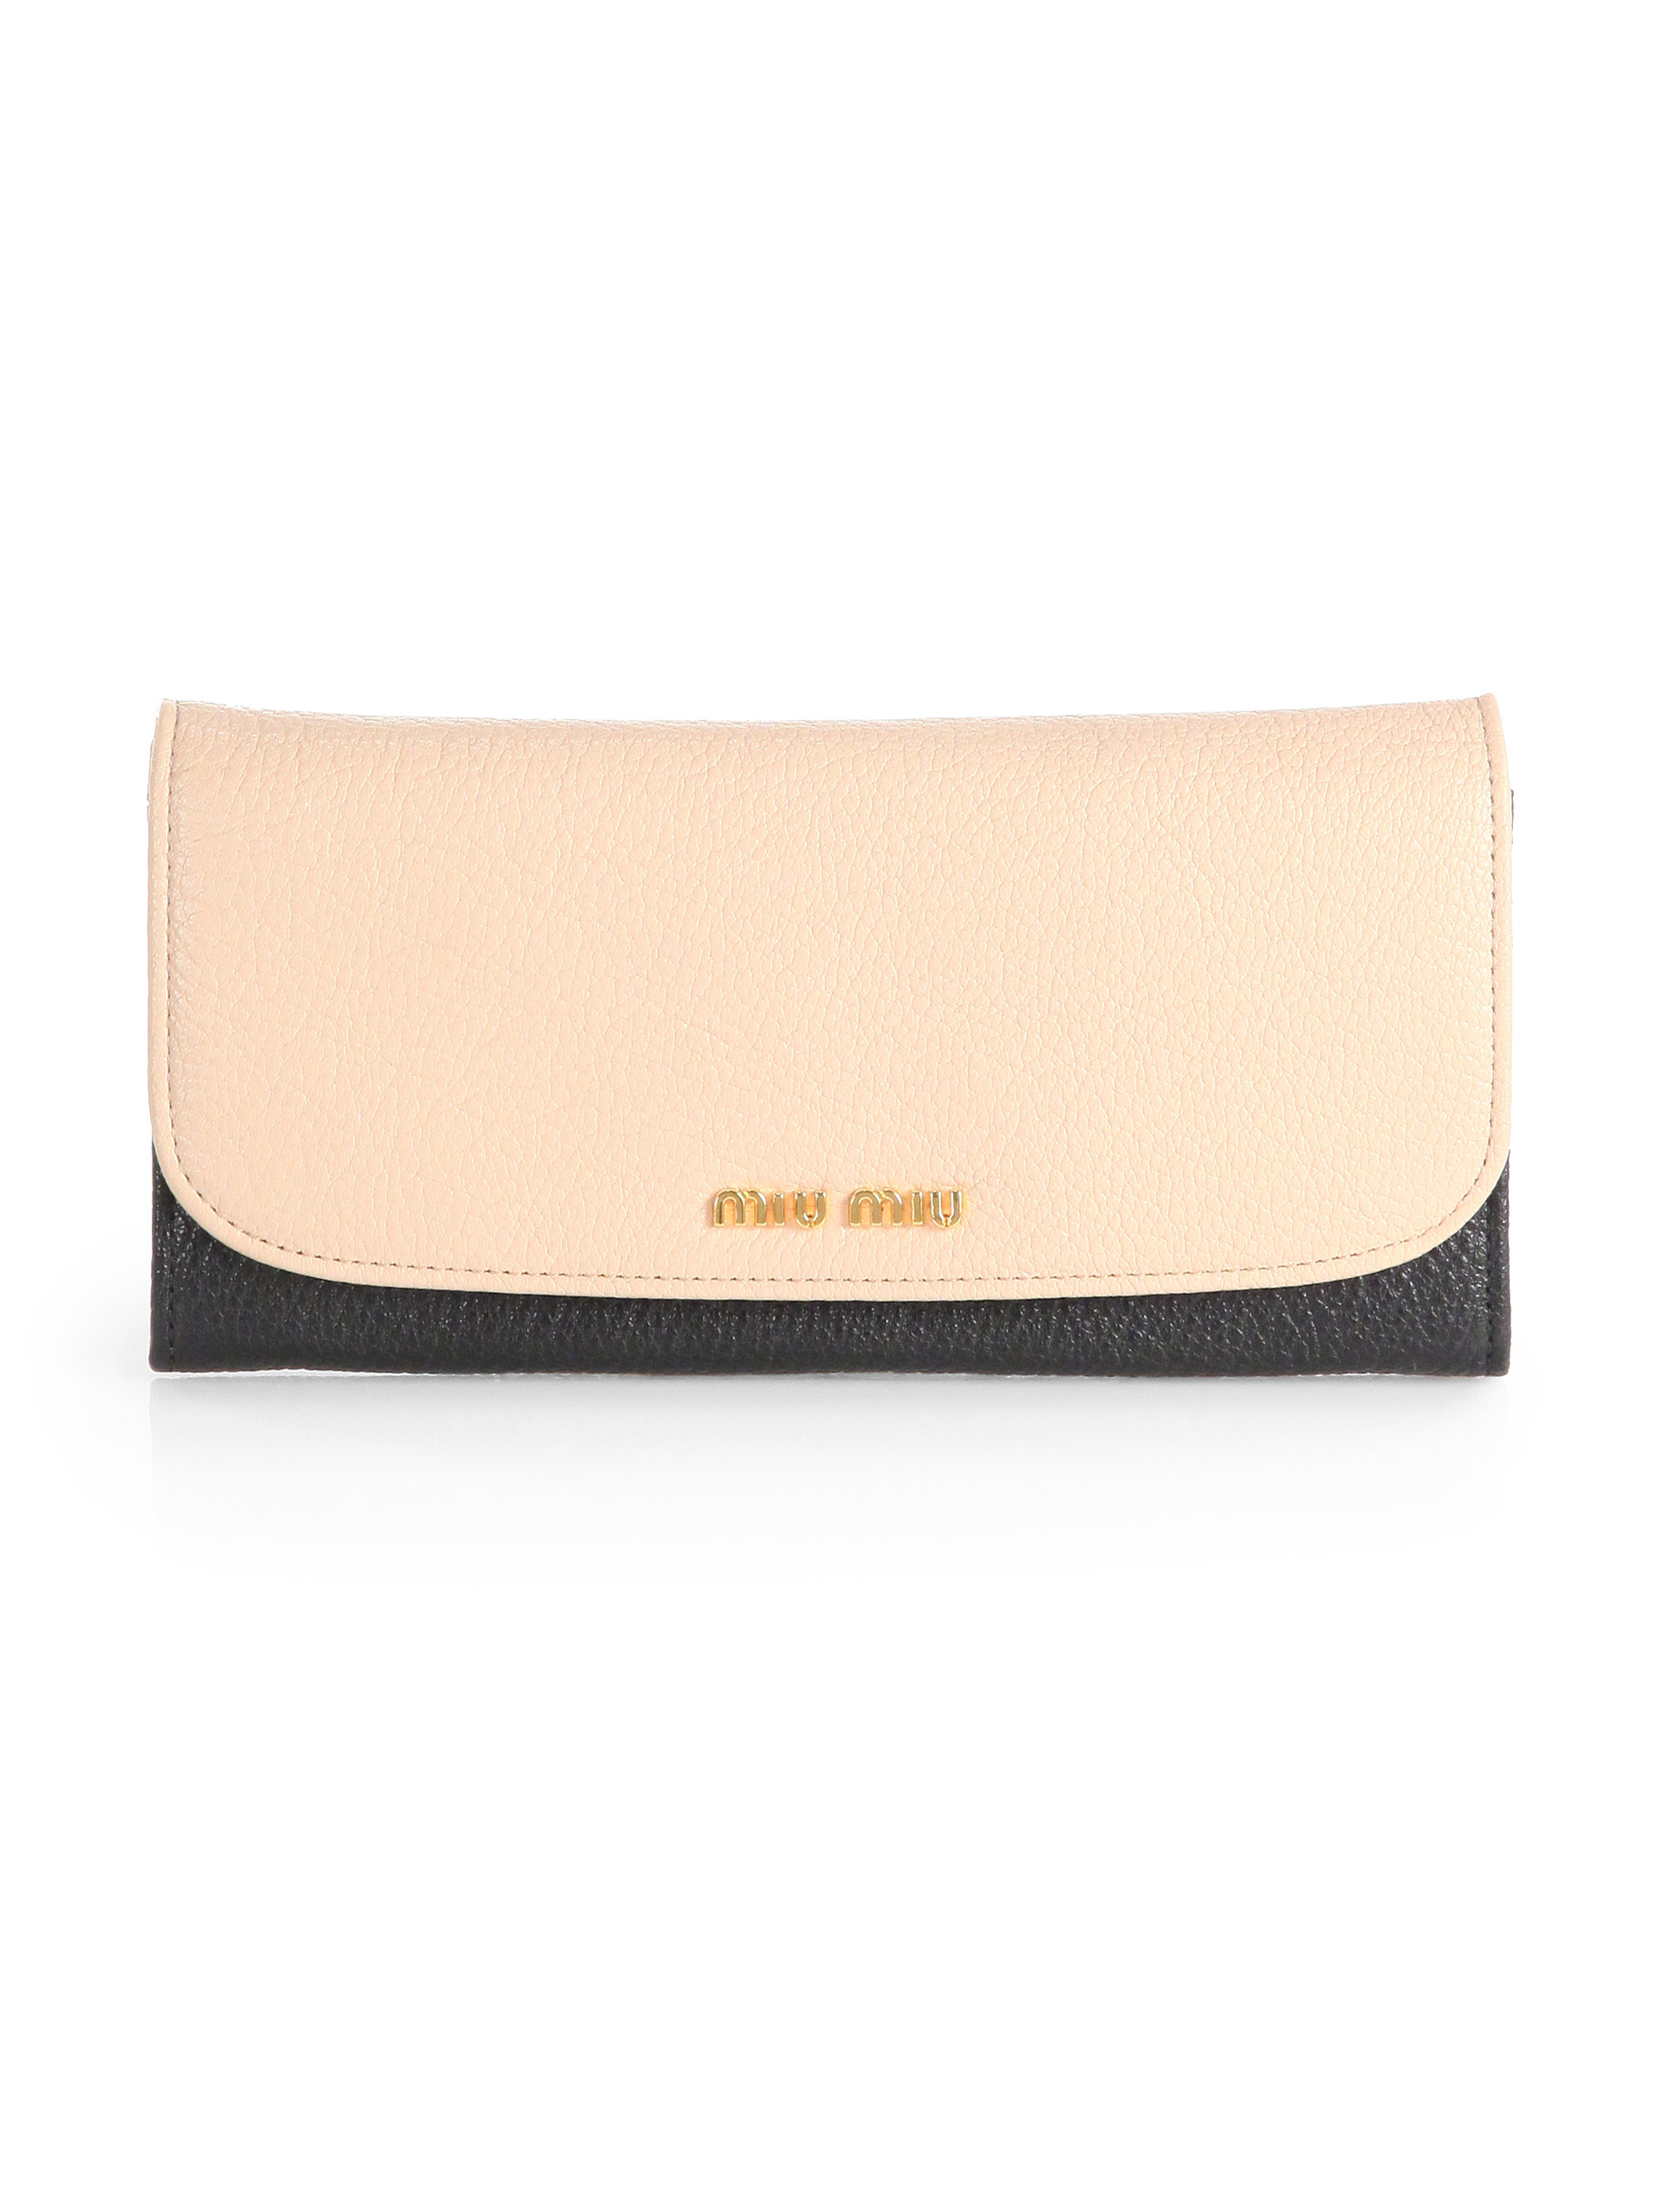 709508463ee miu-miu-pink-madras-bicolor-continental-wallet-product-1-11002468-1-438338784-normal.jpeg